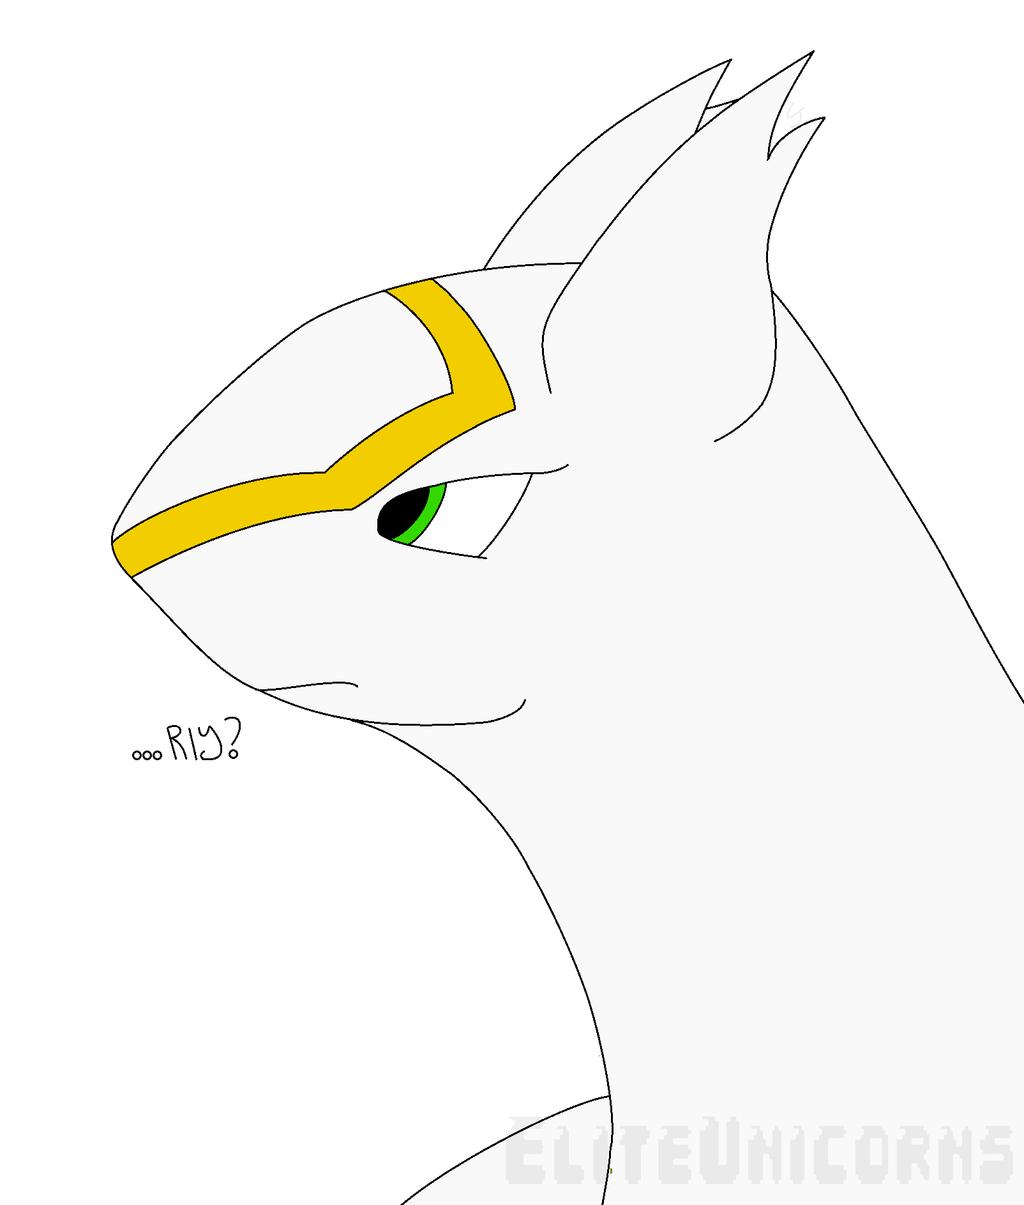 Unamused Latias Shiny Version by EliteUnicorns